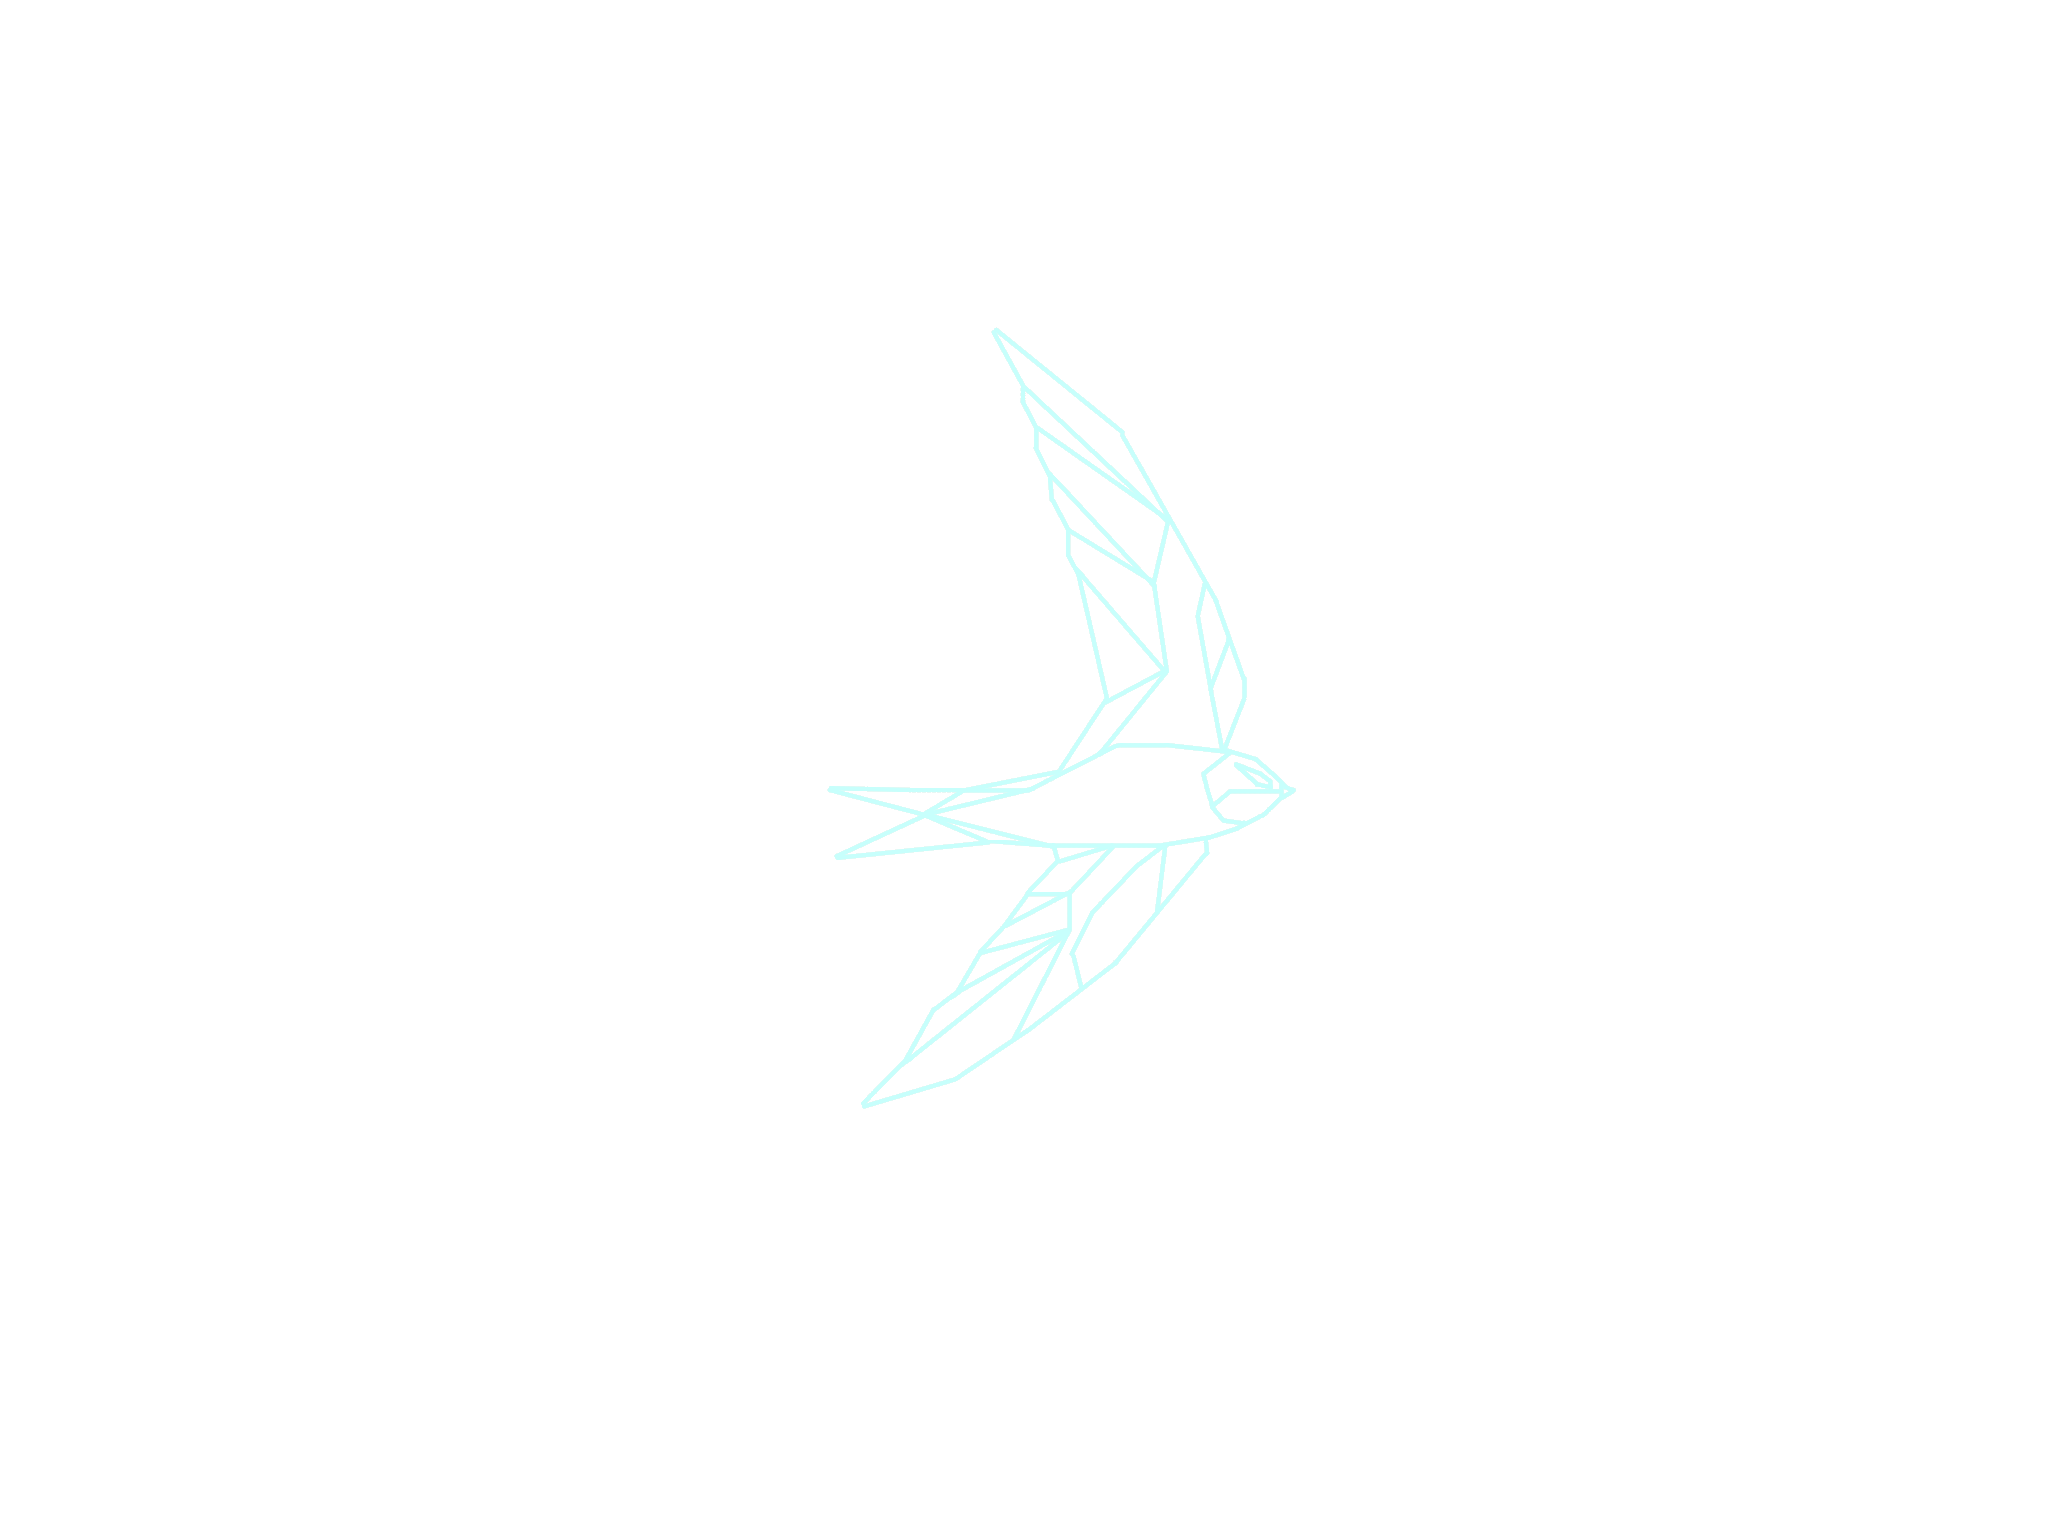 Swift_edited